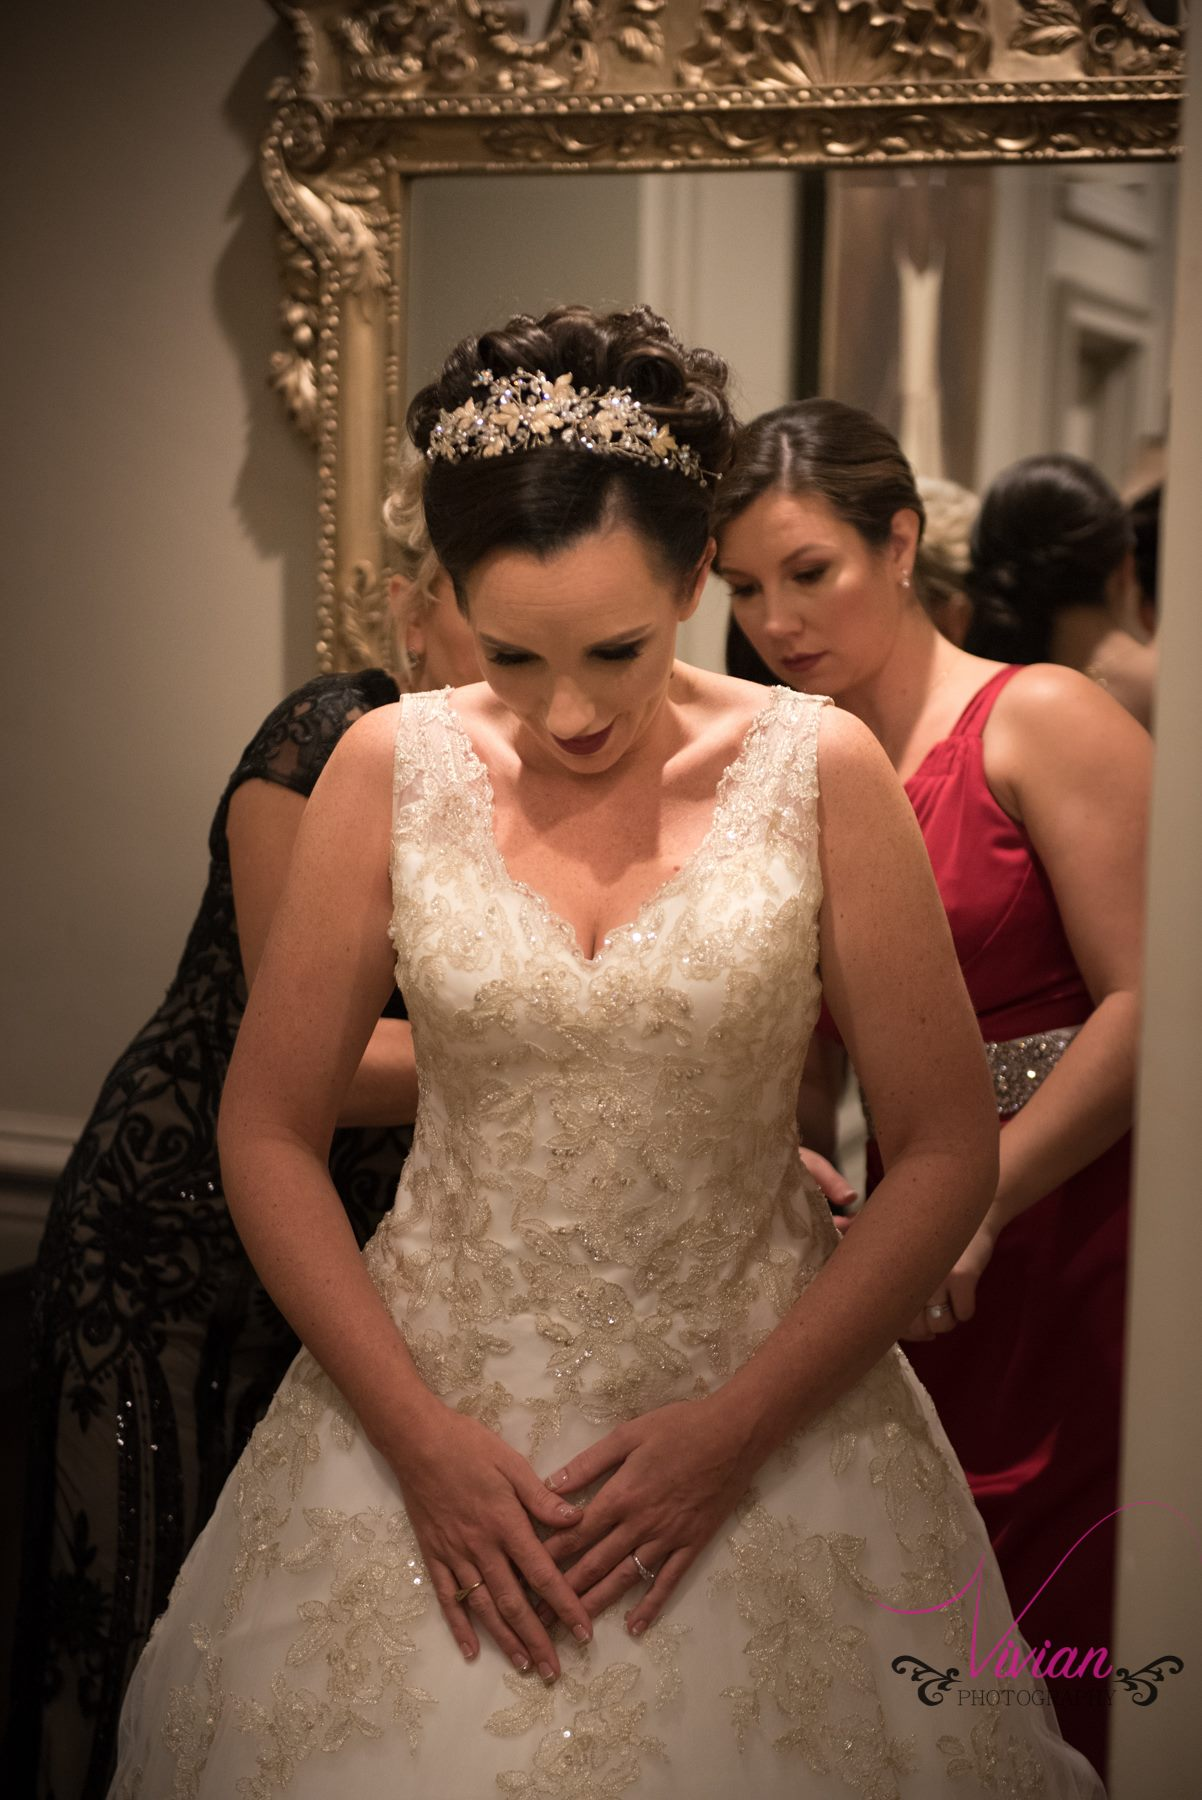 bride-lookin-down-dress-getting-zipped.jpg